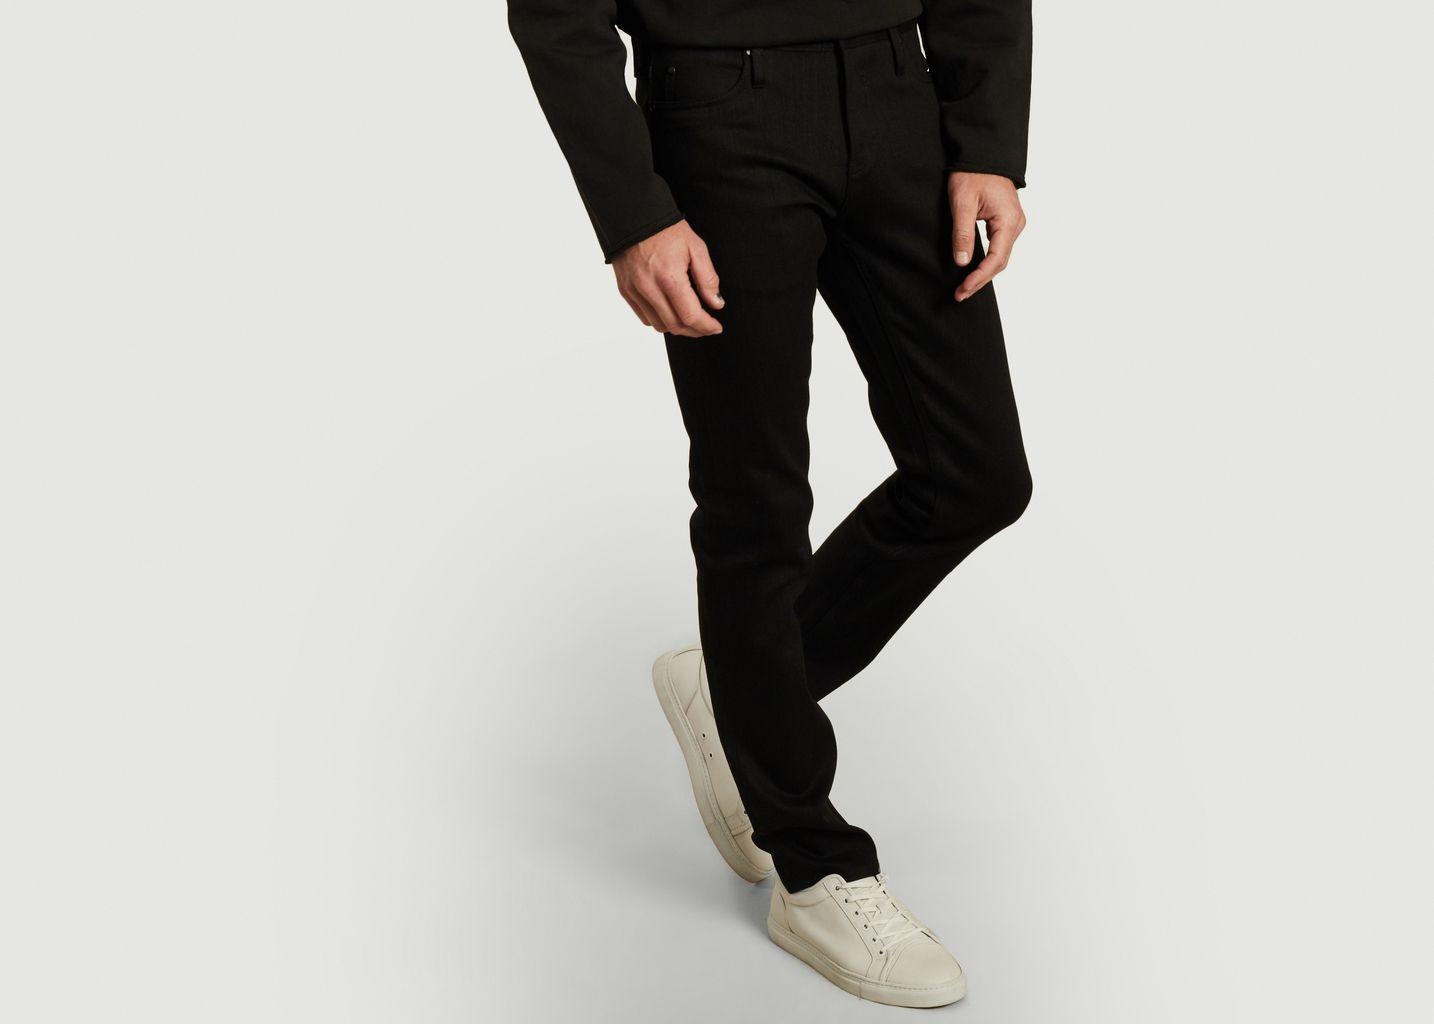 Jean Skinny Solid Black Stretch Selvedge - The Unbranded Brand